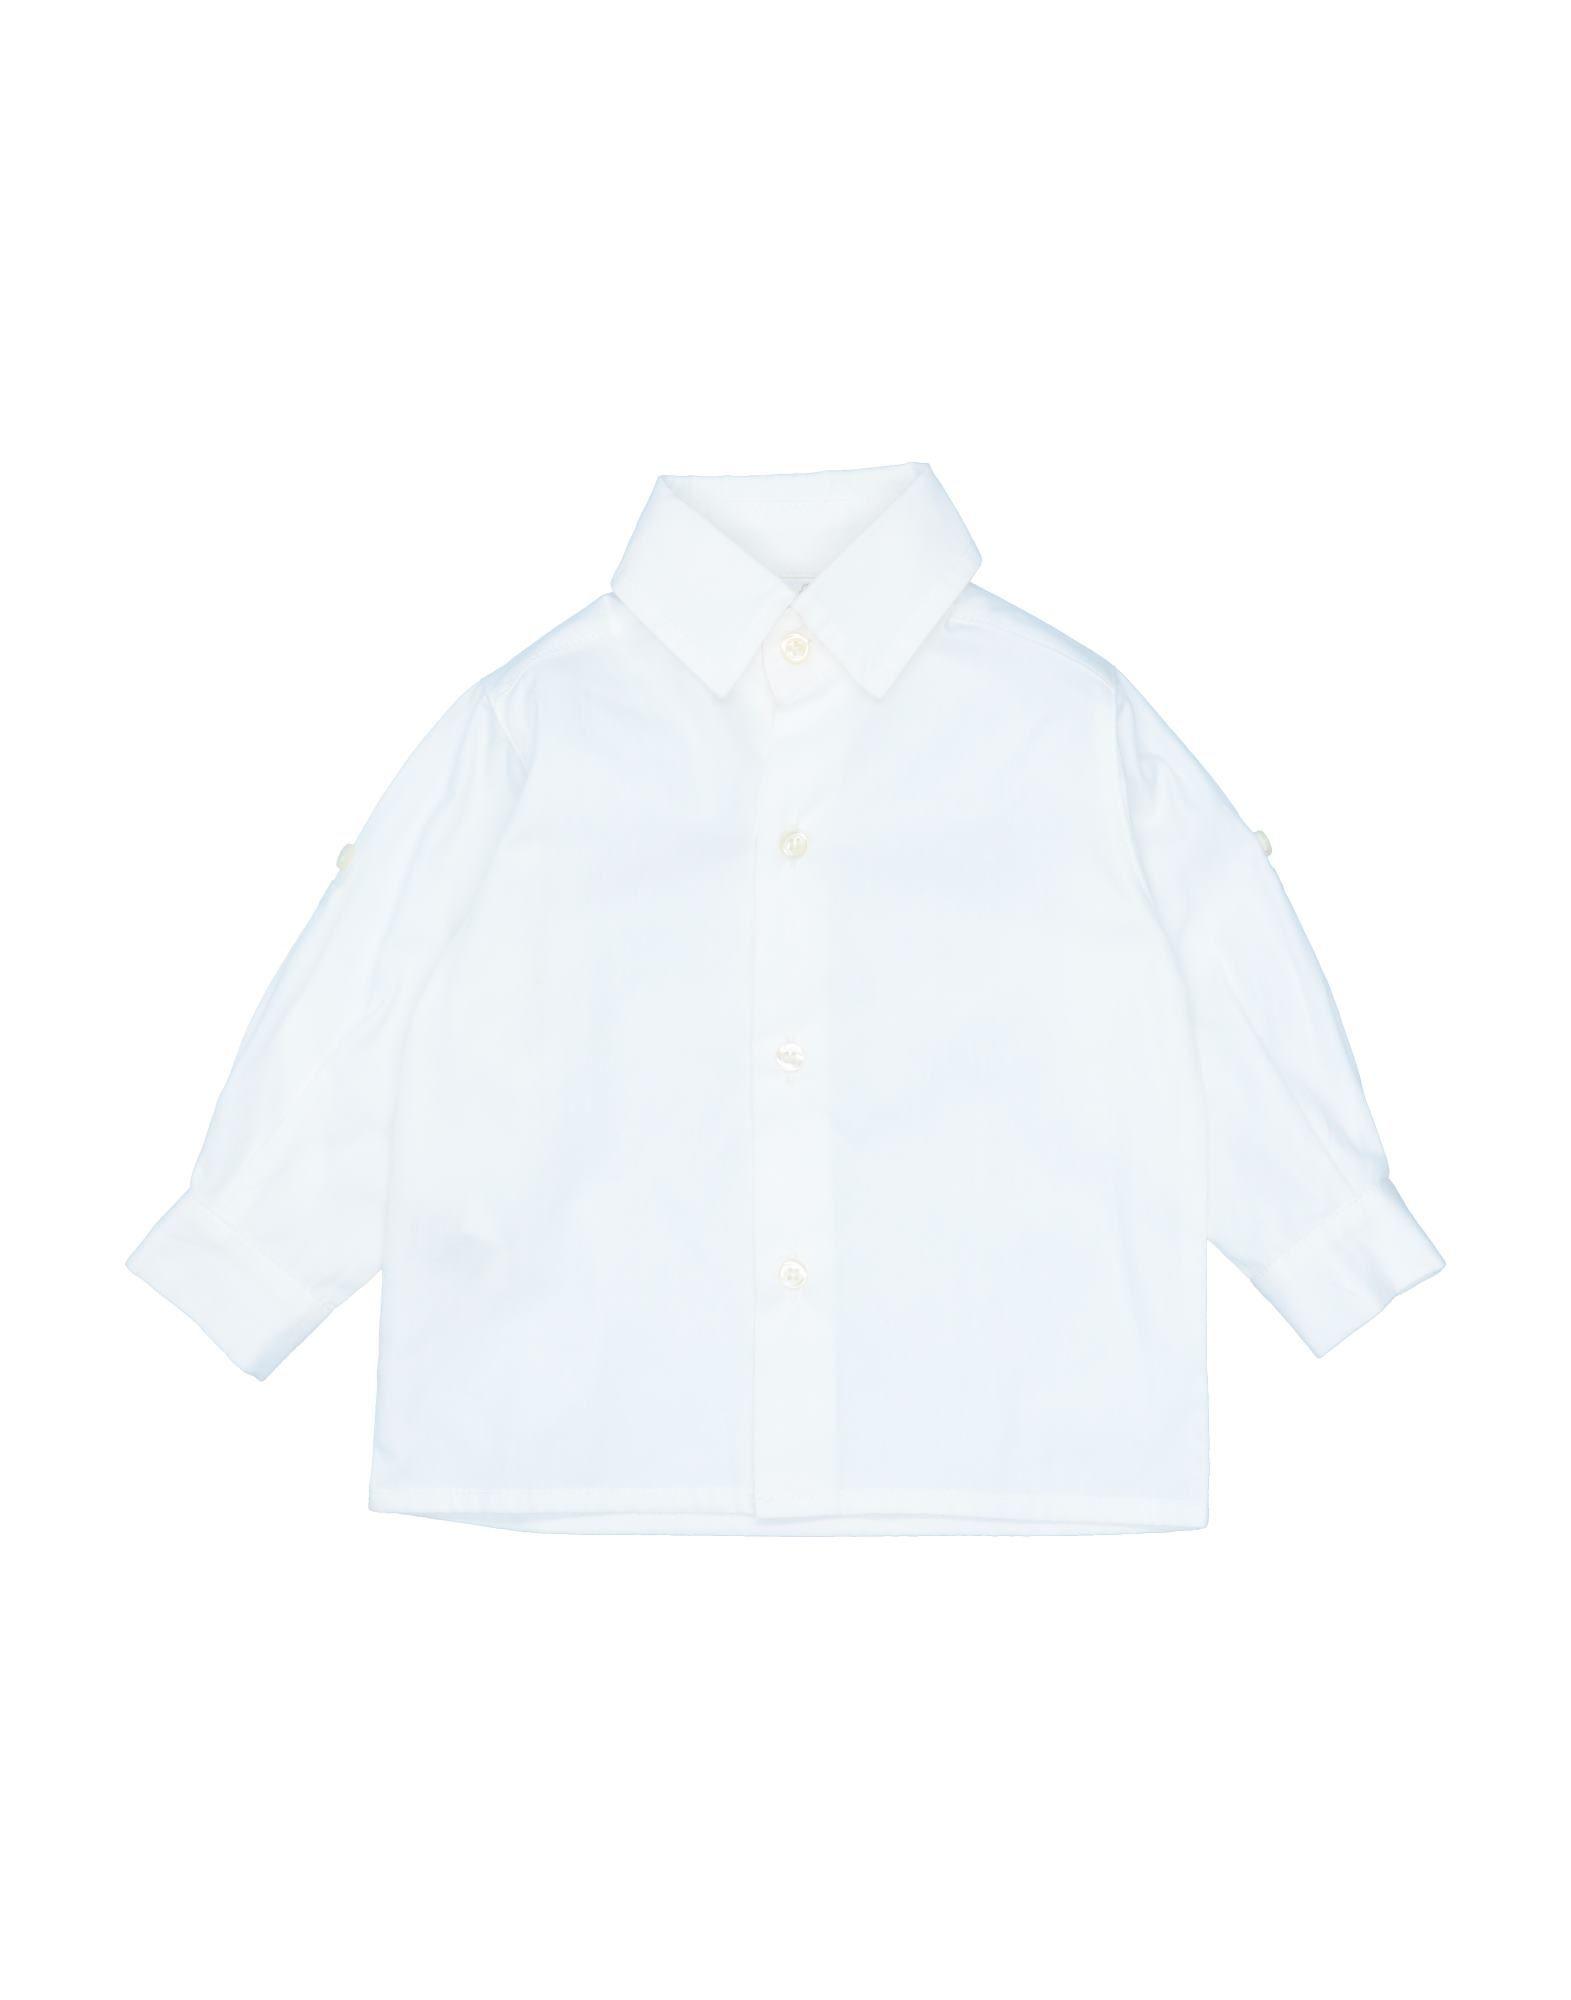 Simona Kids' Shirts In White